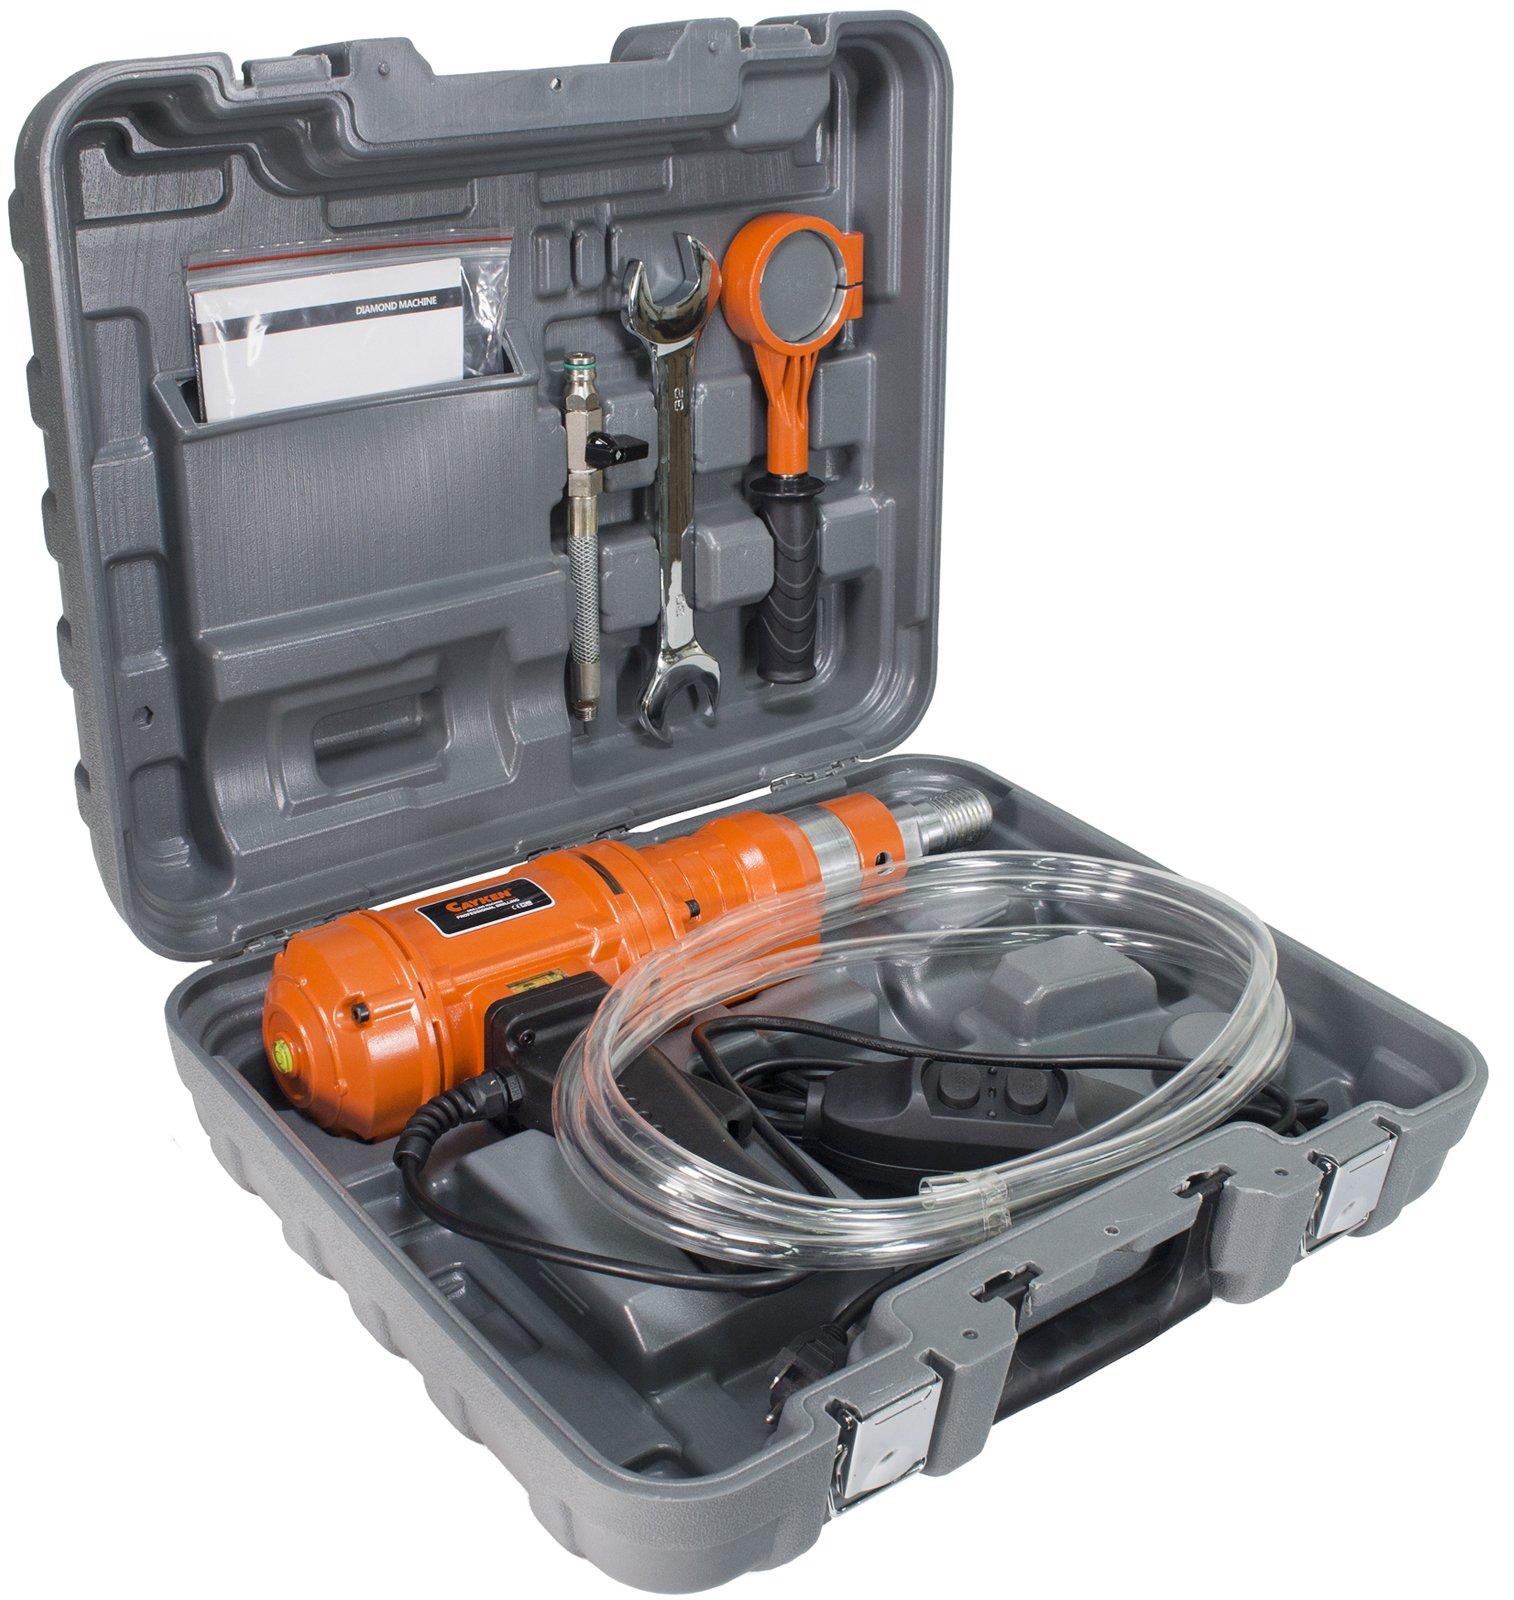 Cayken SCY-1520-2BS 6'' Wet Dry Handheld Diamond Core Drill Rig